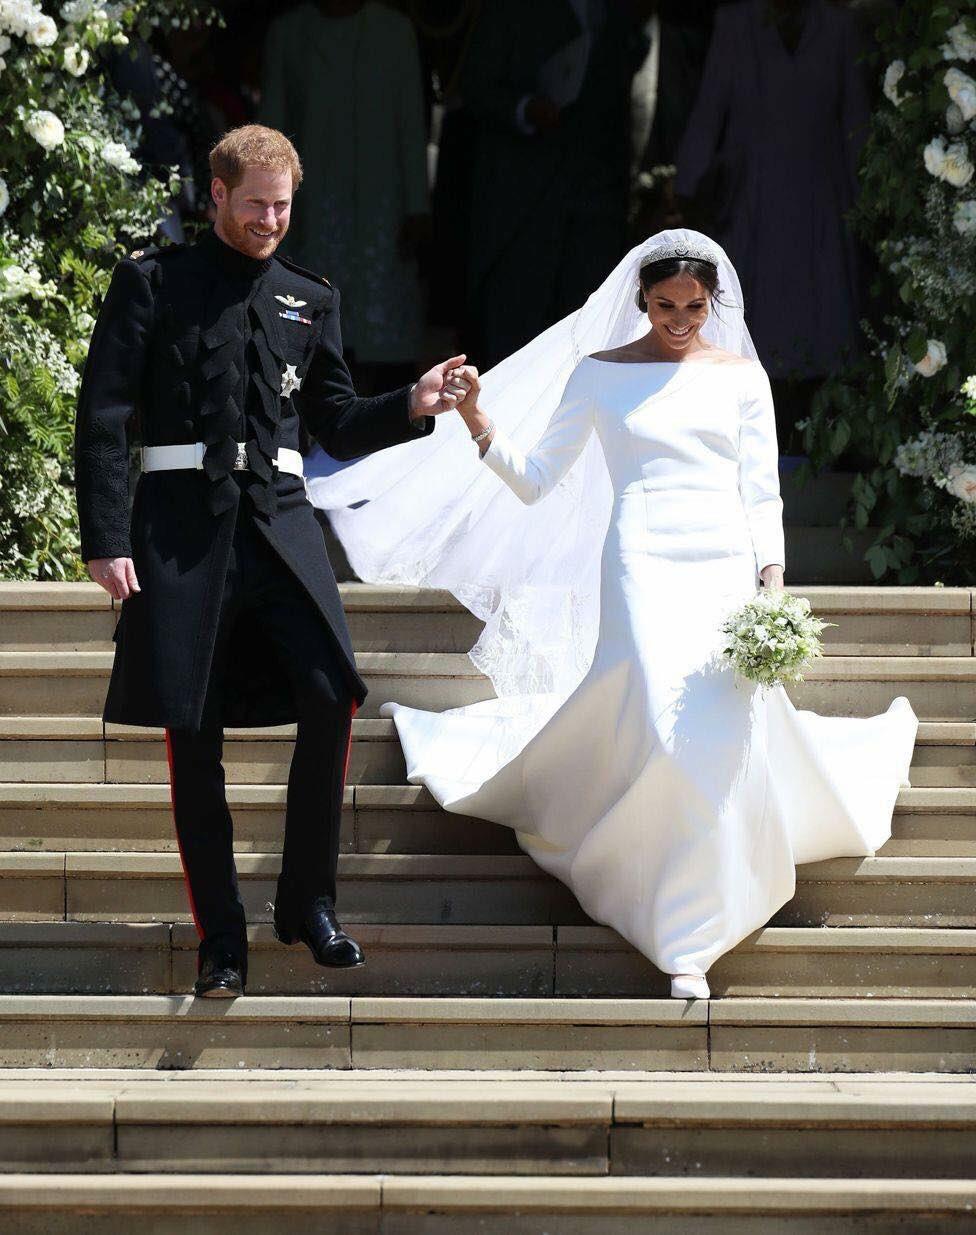 Pin By Andrea Bielka On Royal Wedding Duke Harry And Duchess Meghan Of Sussex Meghan Markle Wedding Dress Meghan Markle Wedding Harry And Meghan Wedding